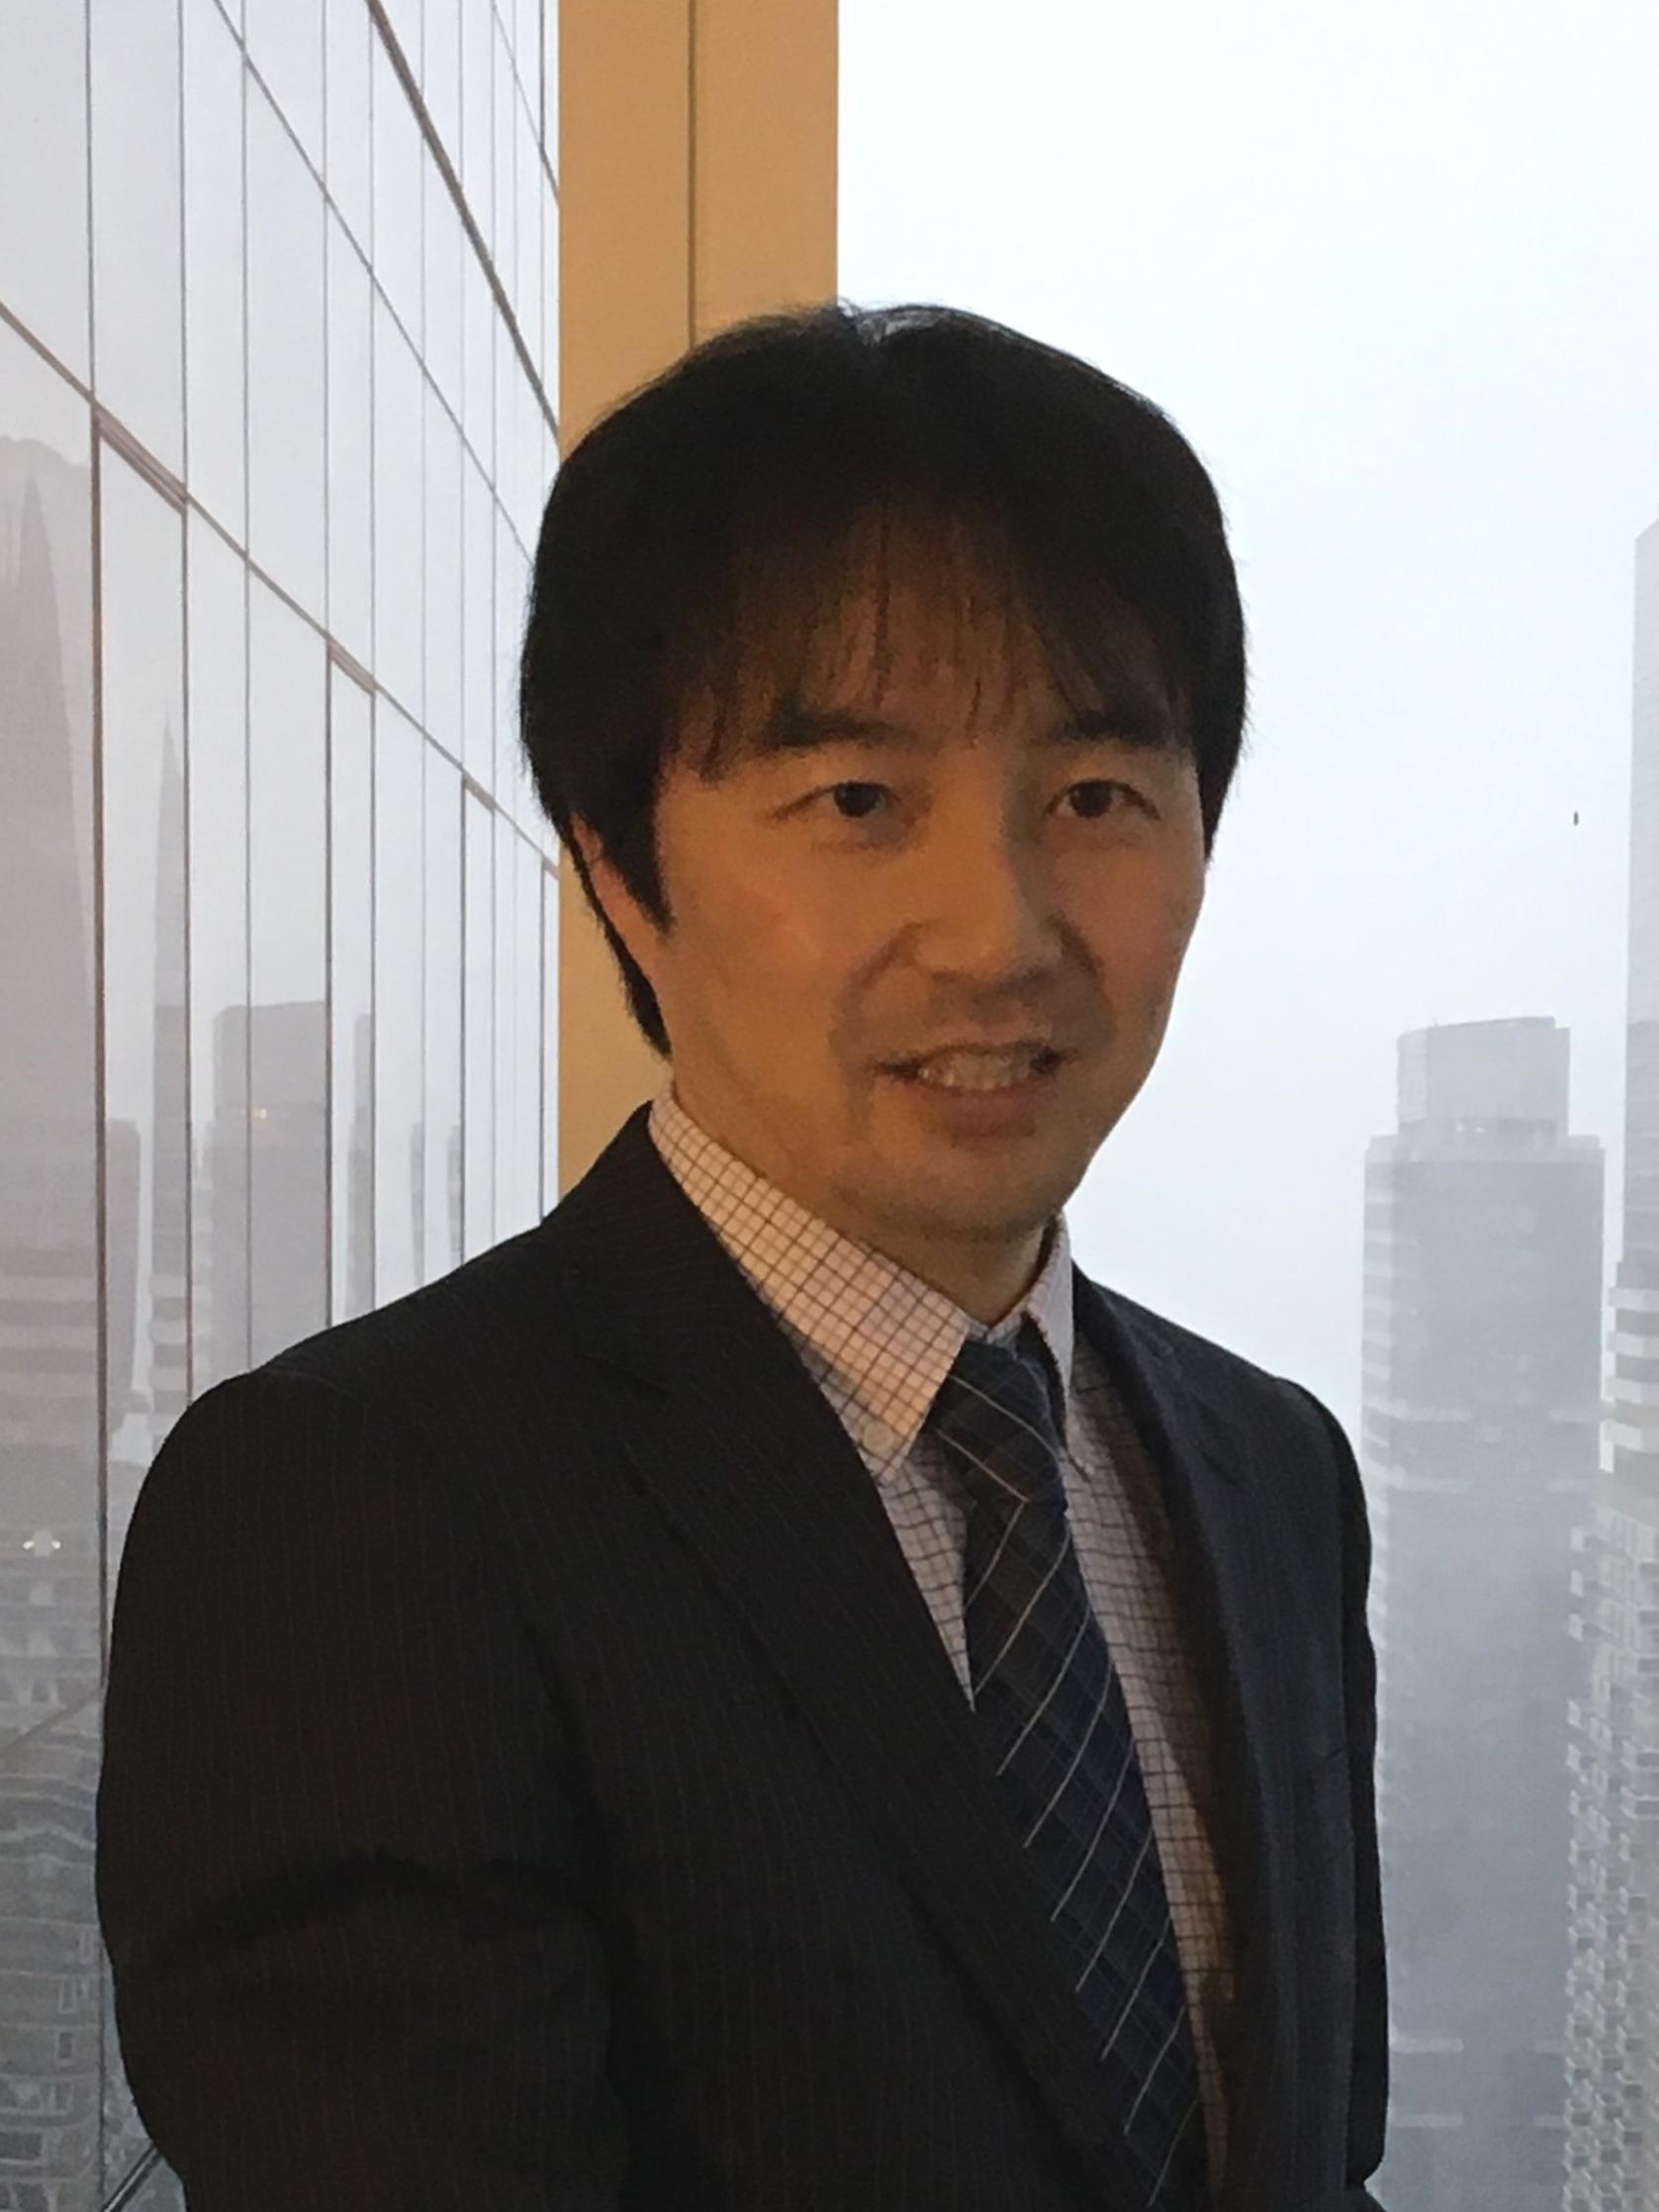 Tomoya Yanagisawa   1) 特許庁 米国知財アタッシェ  2) JETROニューヨーク事務所 知的財産部長  3) 知的財産研究所 ワシントン事務所長    website→